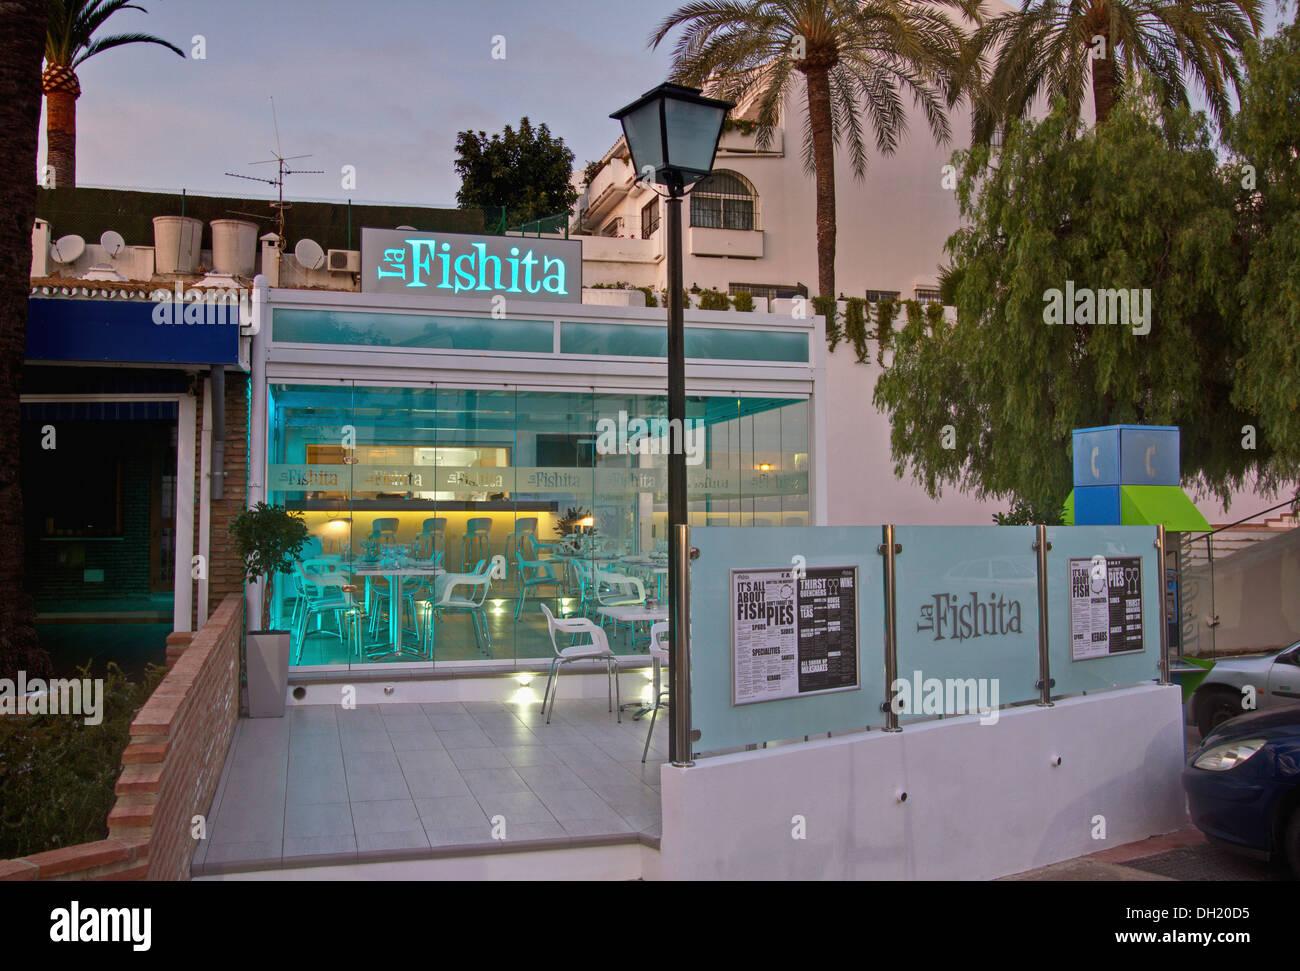 Exterior Of Fishita A Modern Spanish Fish Restaurant Fishita Stock Photo Alamy